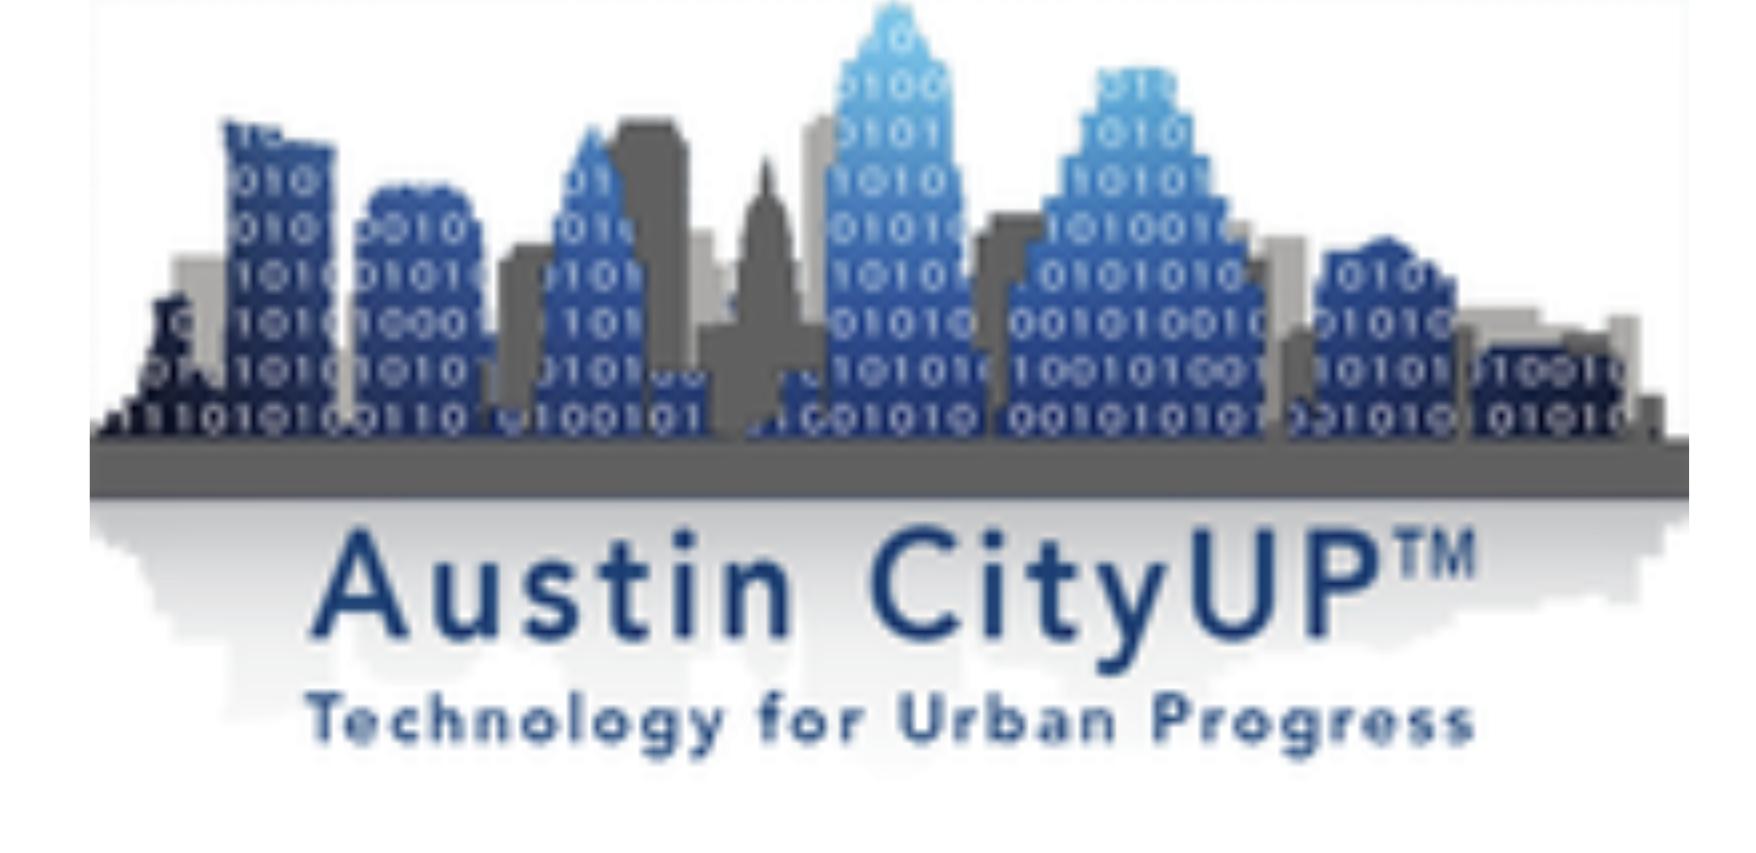 Austin City Up . Technology for Urban Progress . Smart City case competition utexas